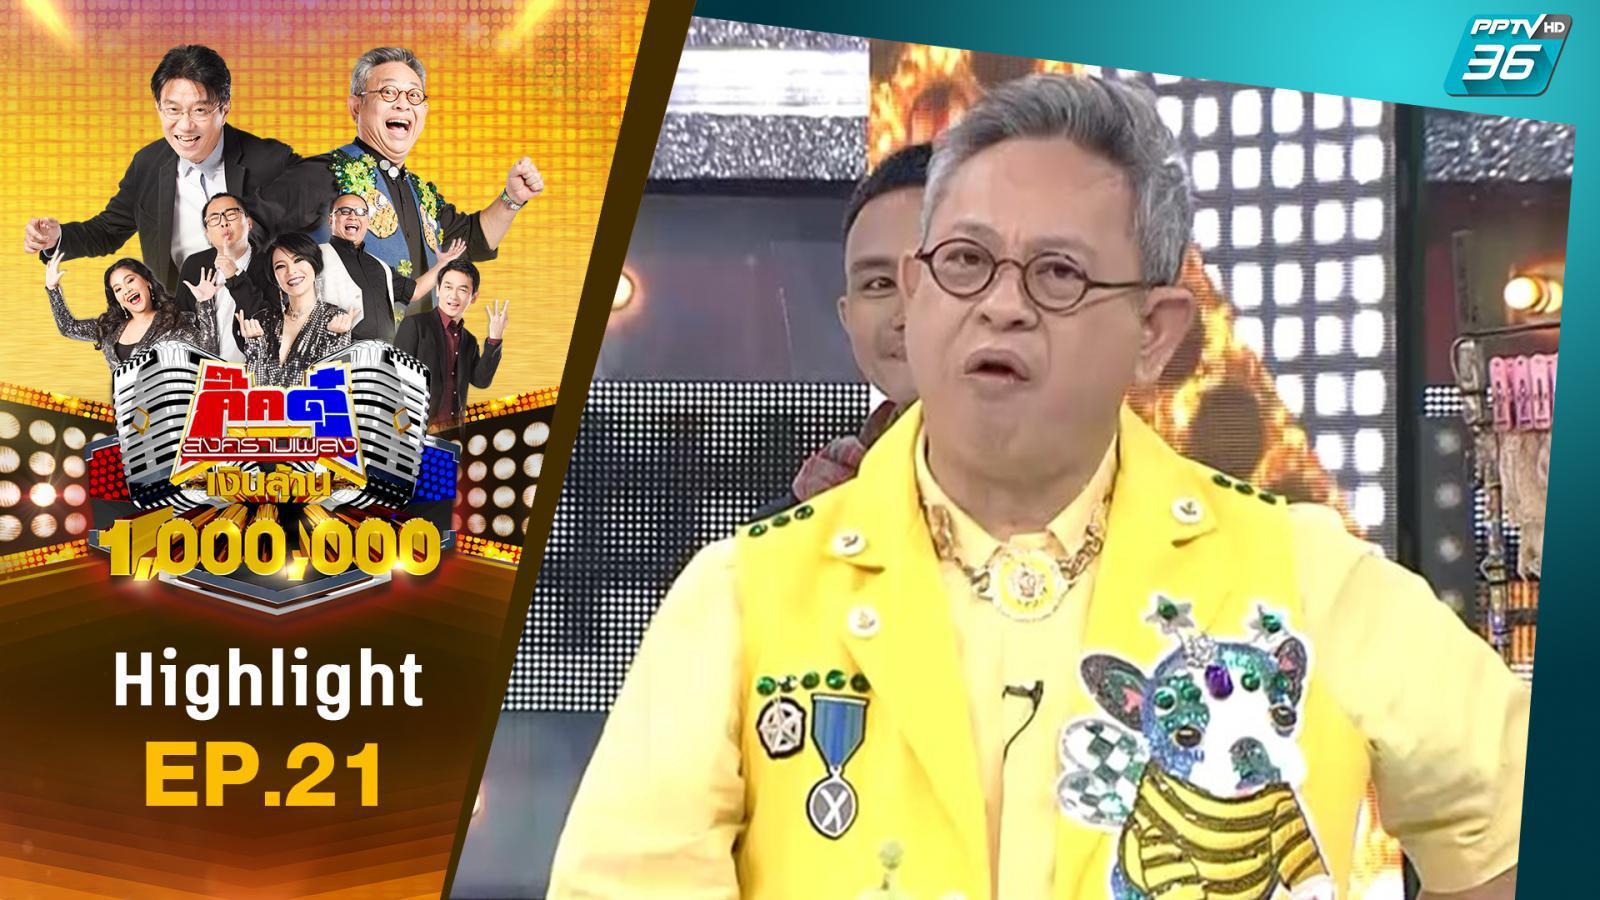 Highlight EP.21 | ไหมไทย หัวใจศิลป์ | วิธีกินหมึกย่างแบบฟิวชั่น